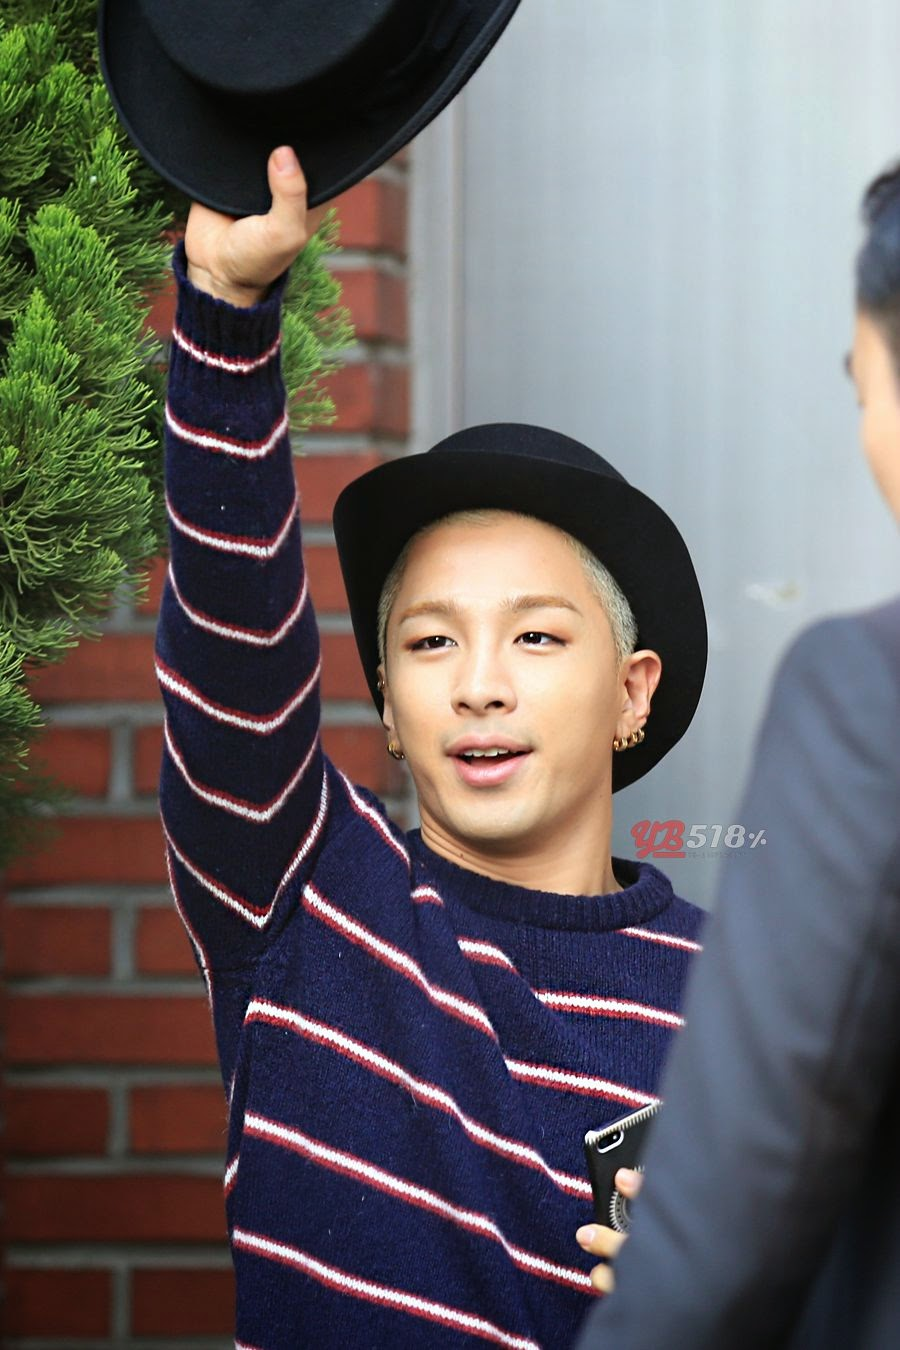 Tae Yang - BIGBANG Fan Meeting in Seoul - 18oct2014 - Fansite - YB 518% - 02.jpg